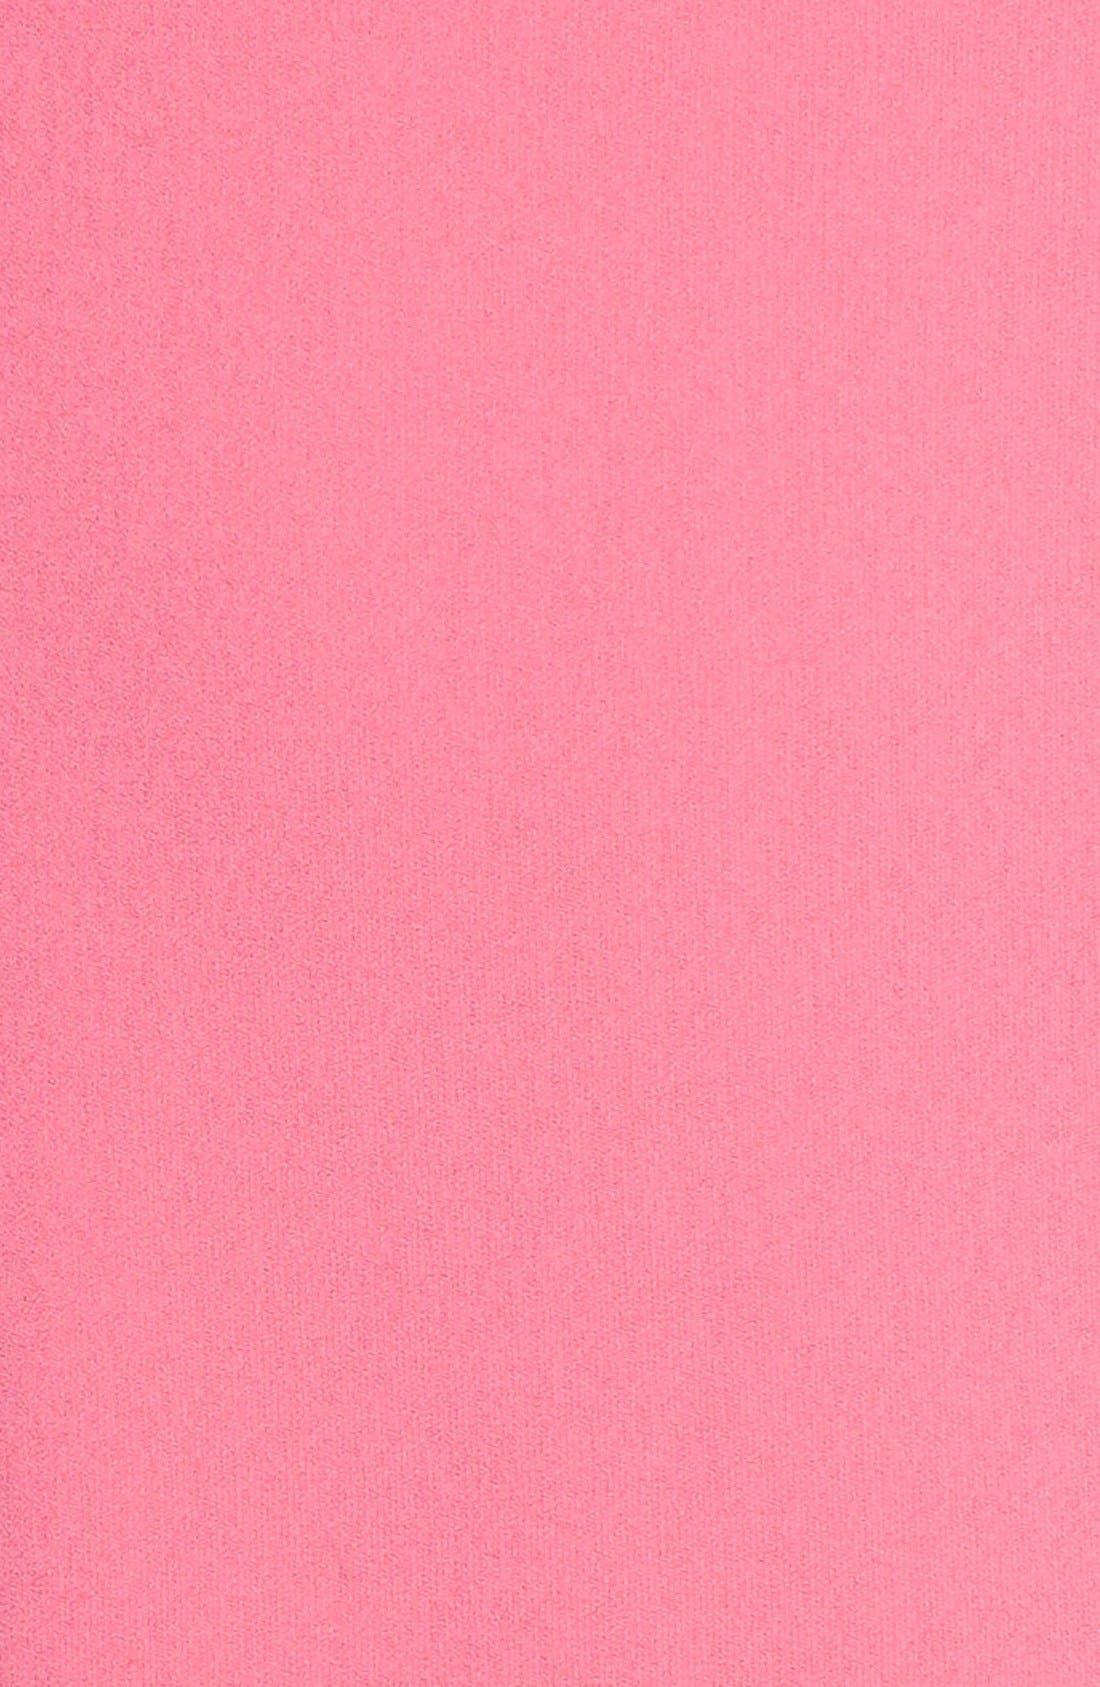 Ava Off the Shoulder Dress,                             Alternate thumbnail 6, color,                             Tulip Pink